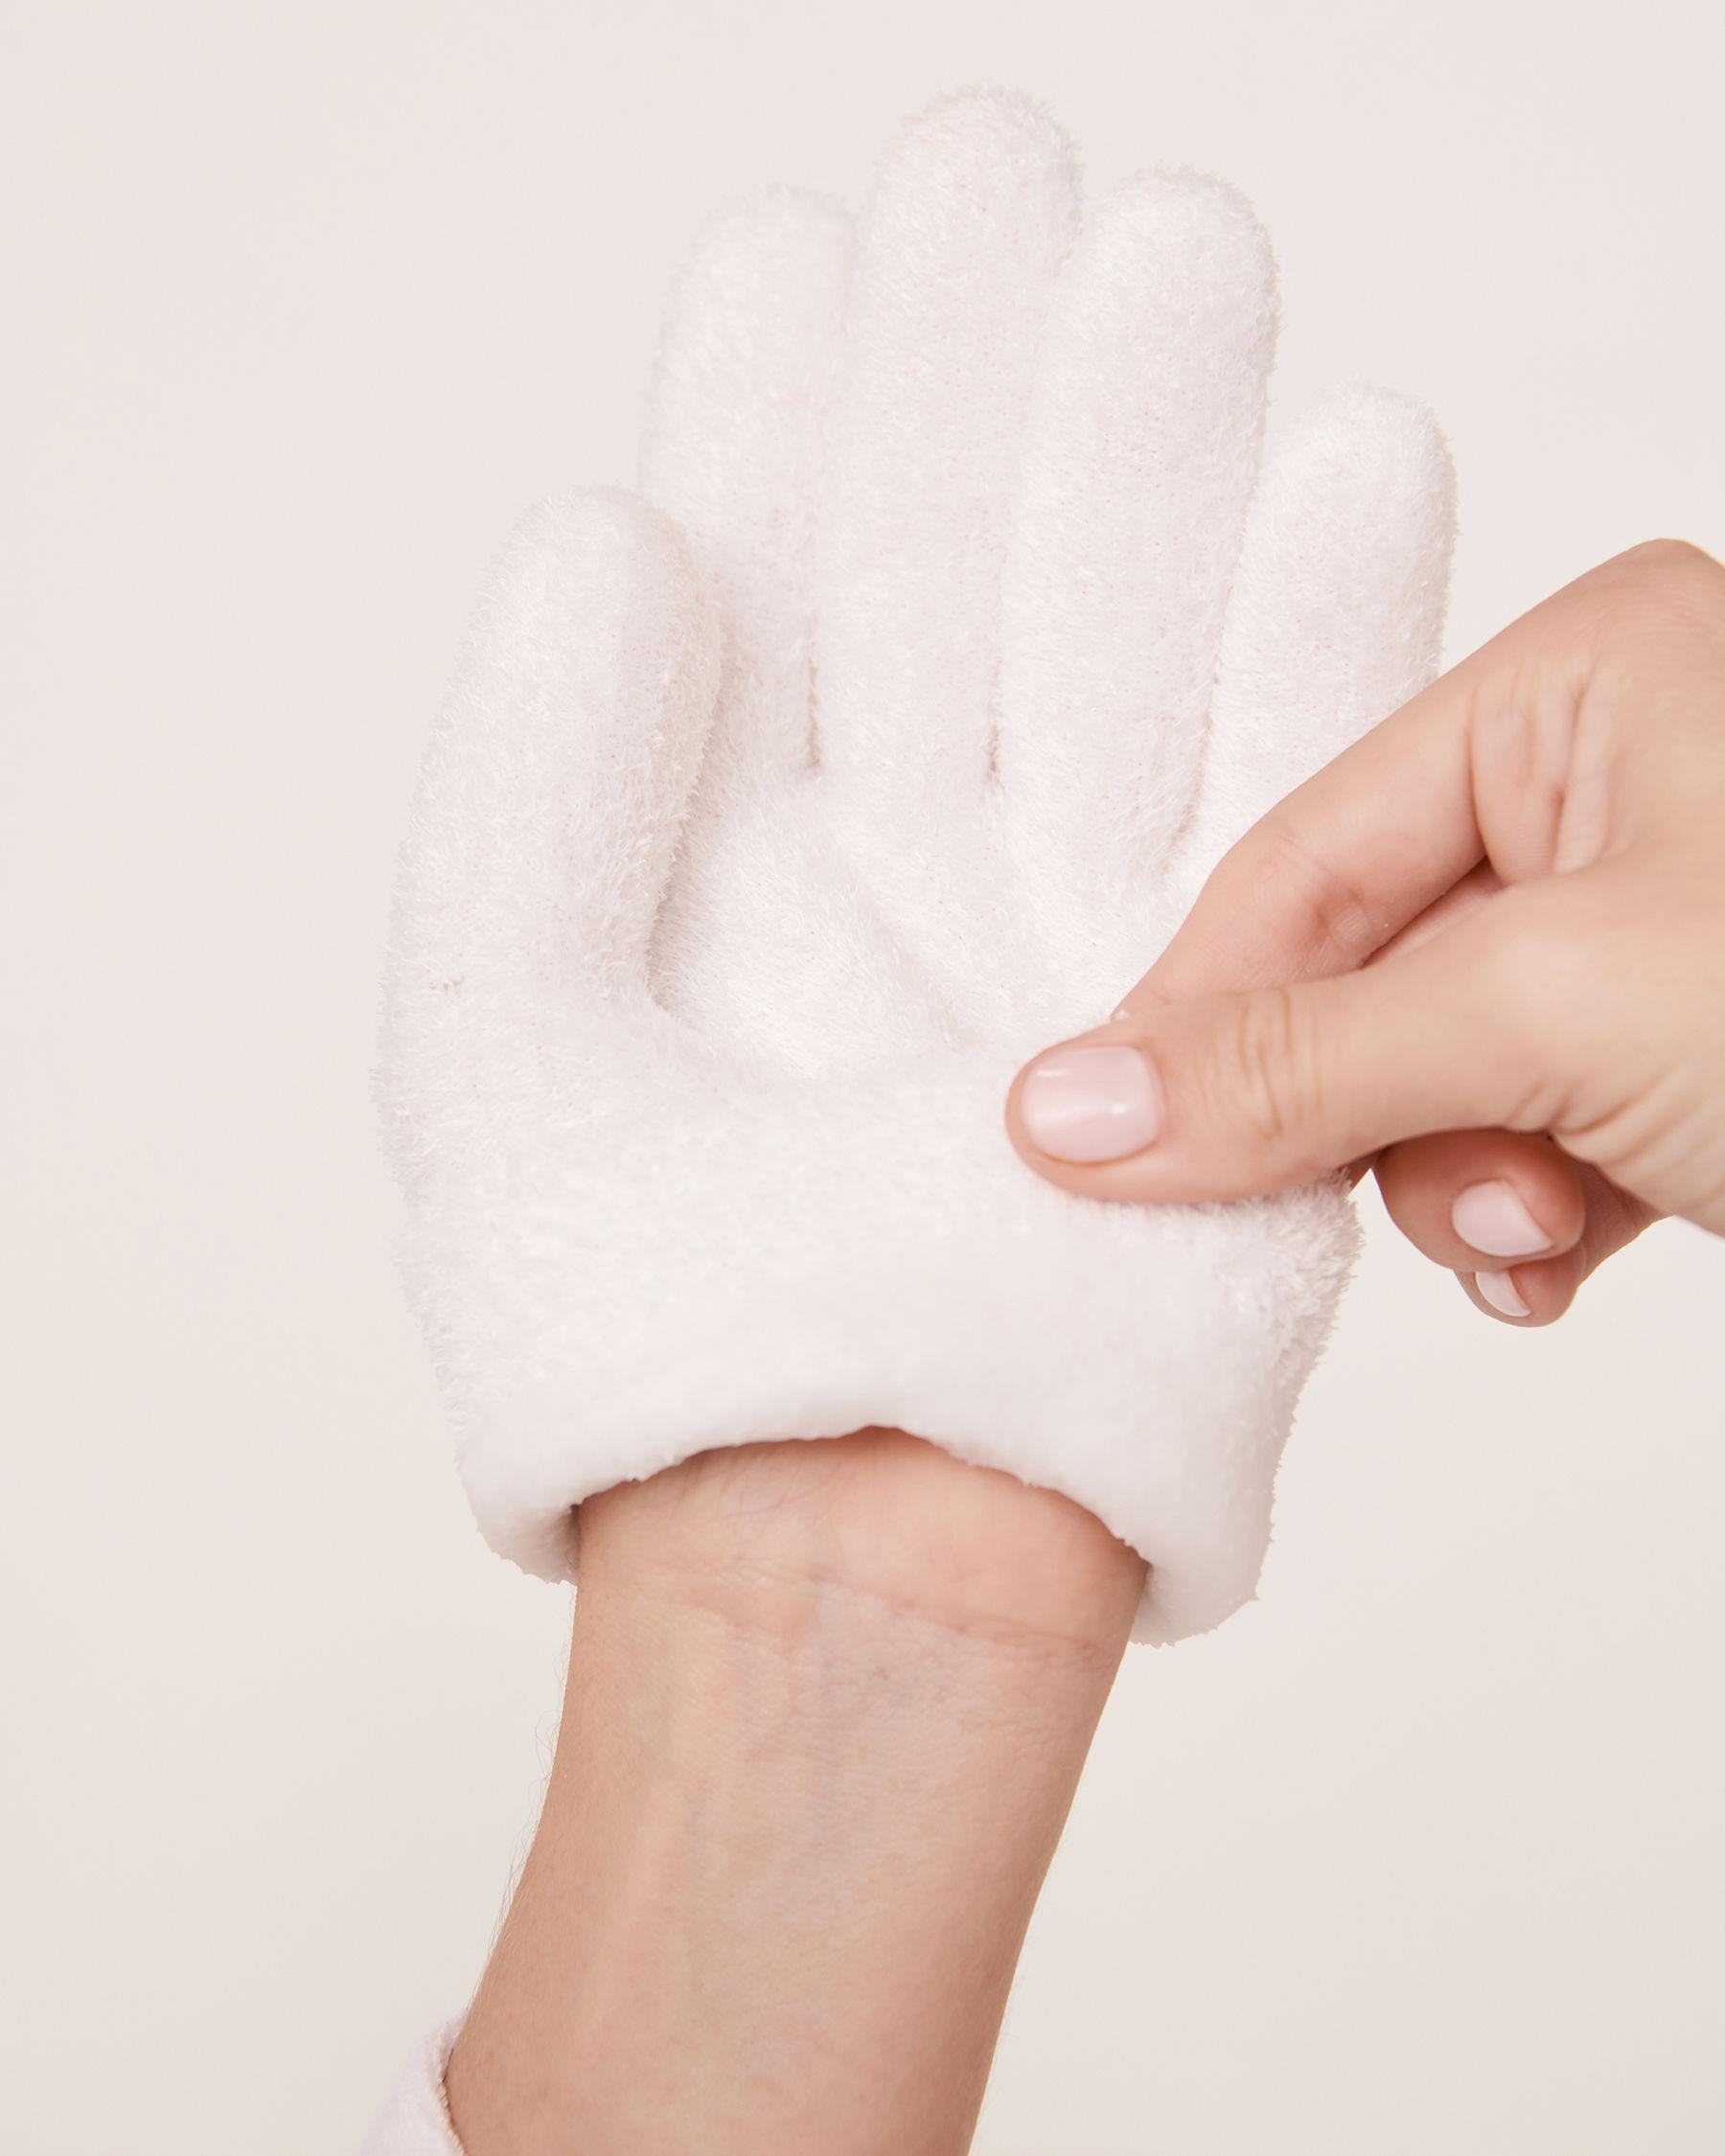 LA VIE EN ROSE Eucalyptus Moisturizing Gel Gloves White 431-527-0-00 - View2